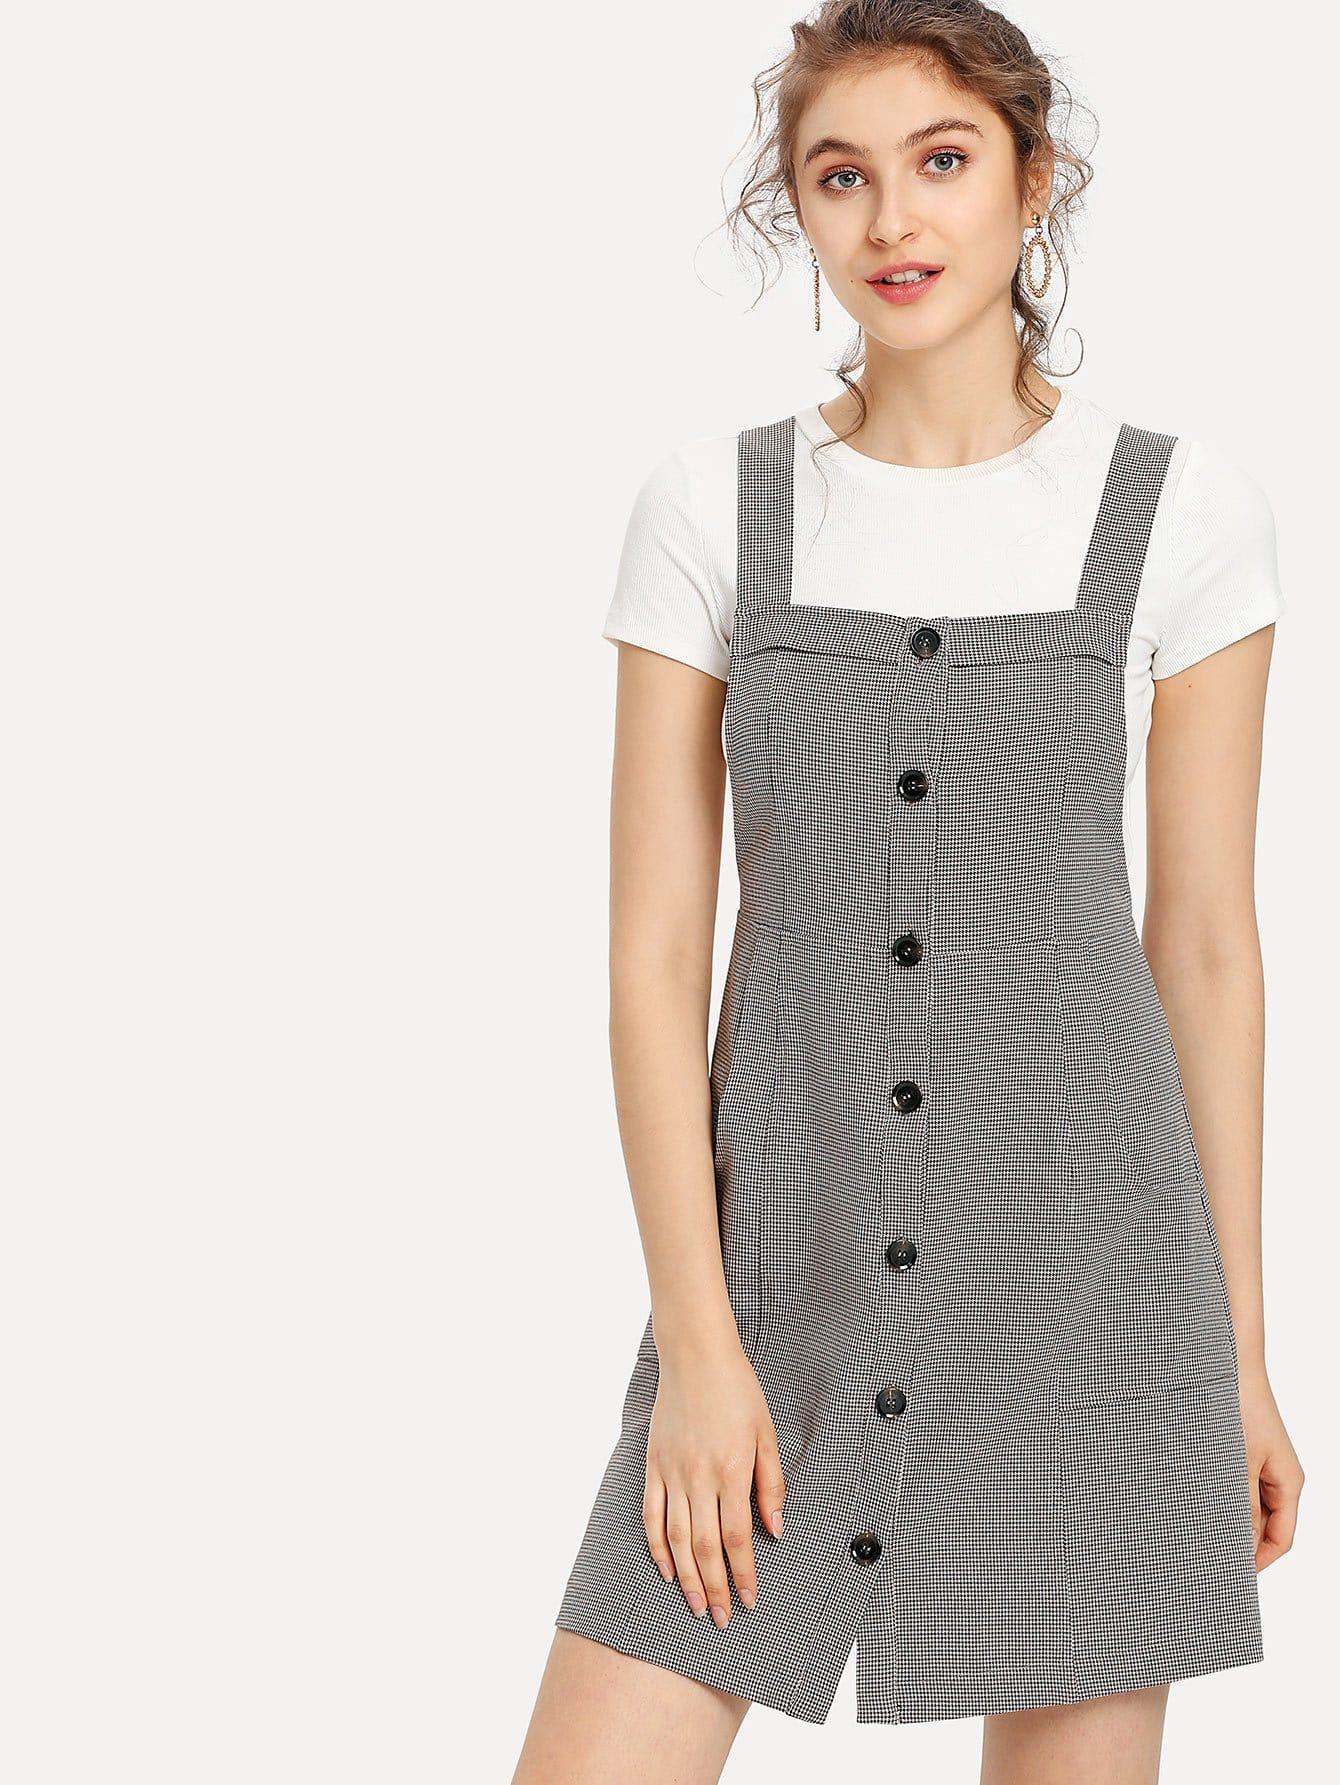 Button Up Pocket Front Plaid Pinafore Dress zip up side plaid dress